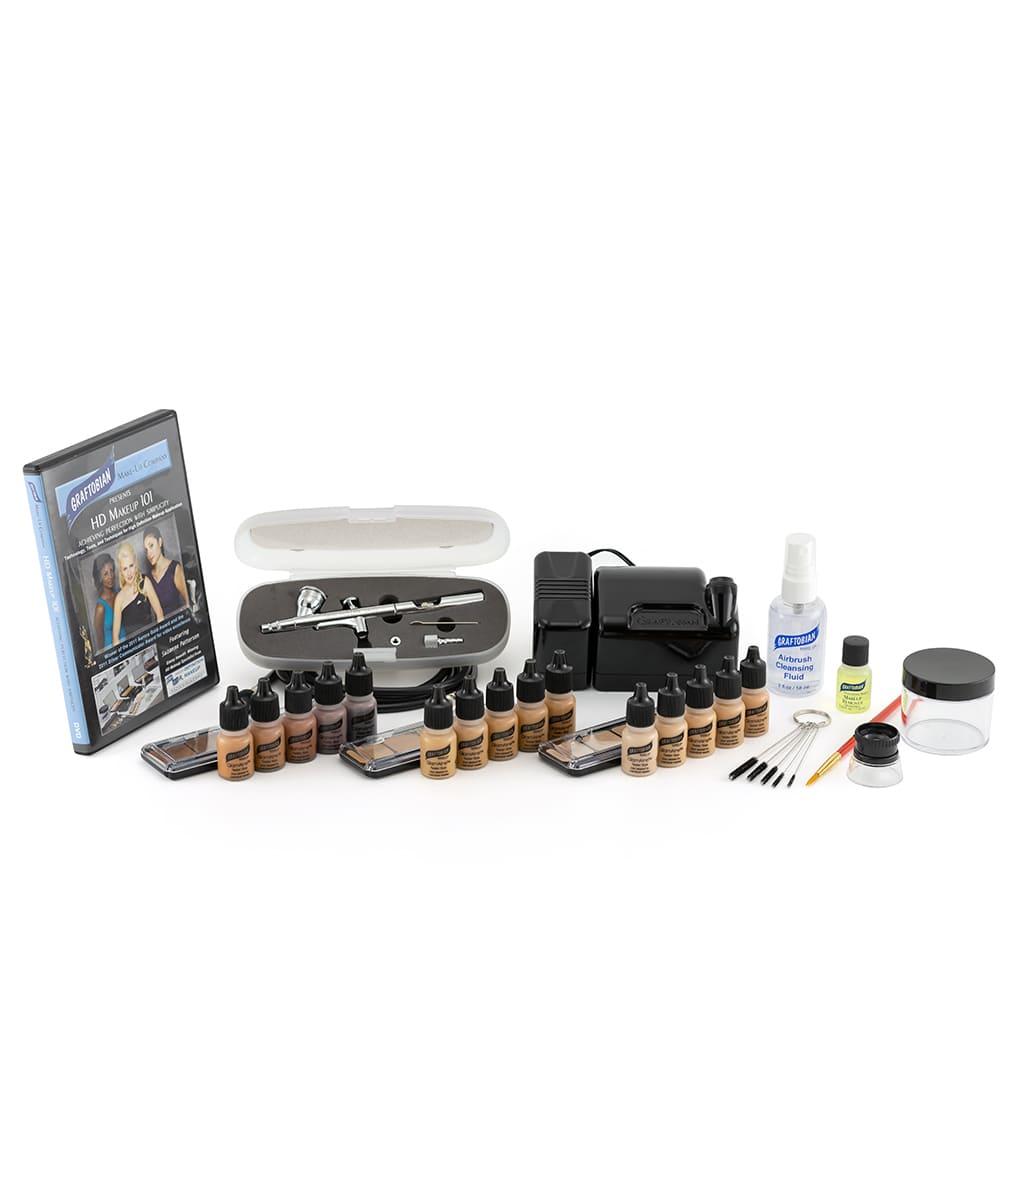 Walk-Around™ System Airbrush Makeup Kits - GlamAire™ Ultra HD Beauty Set